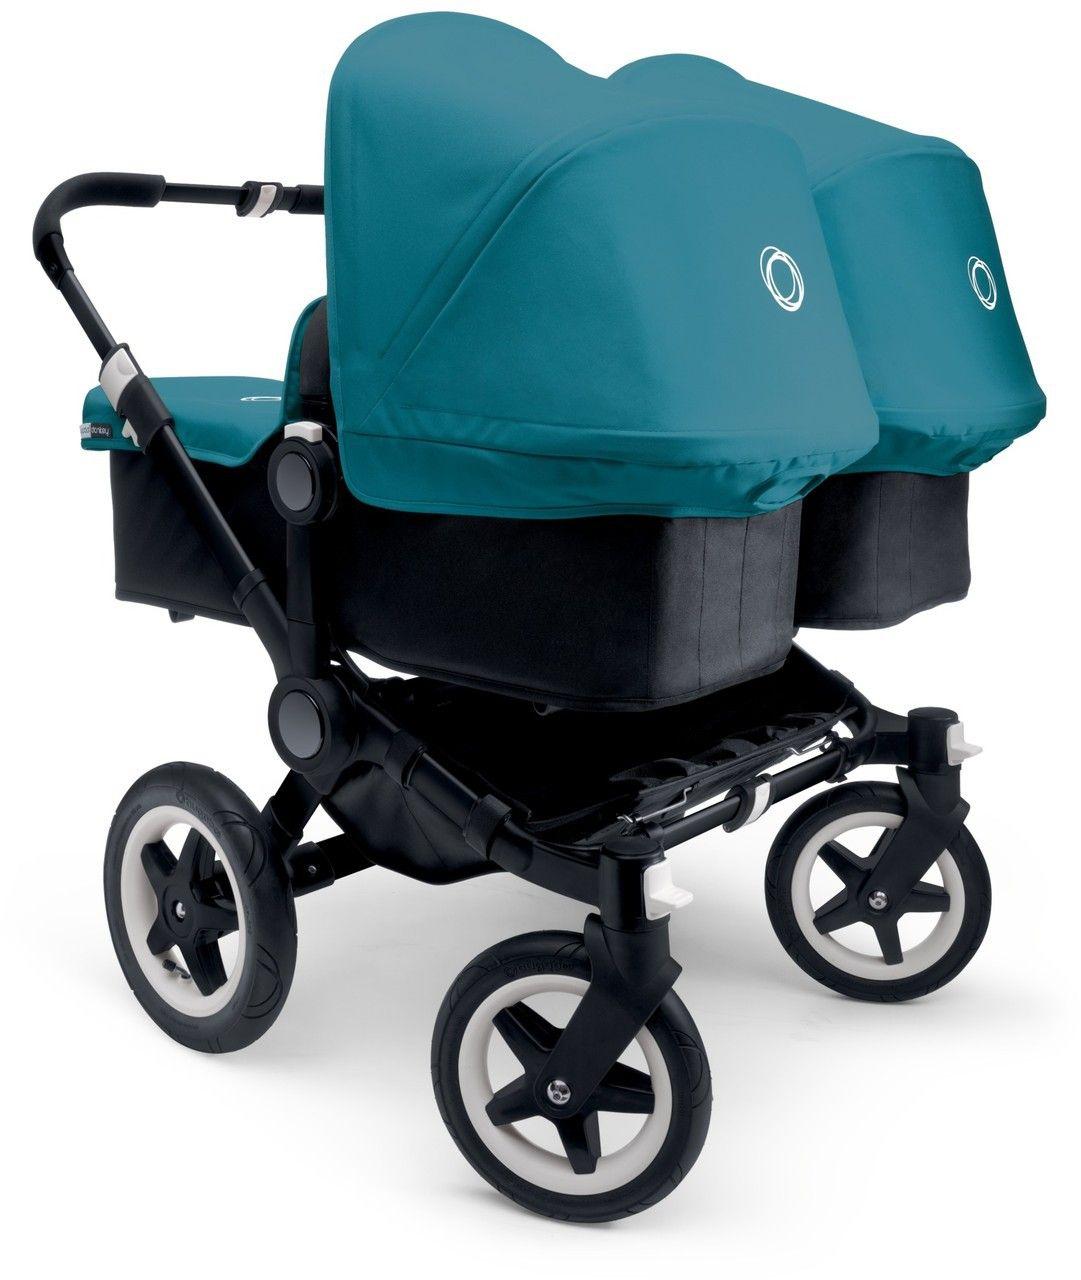 Bugaboo Donkey Twin Zwillingskinderwagen Set Schwarz Petrol Blue Zwillingskinderwagen Kinderwagen Zwillinge Kinder Wagen